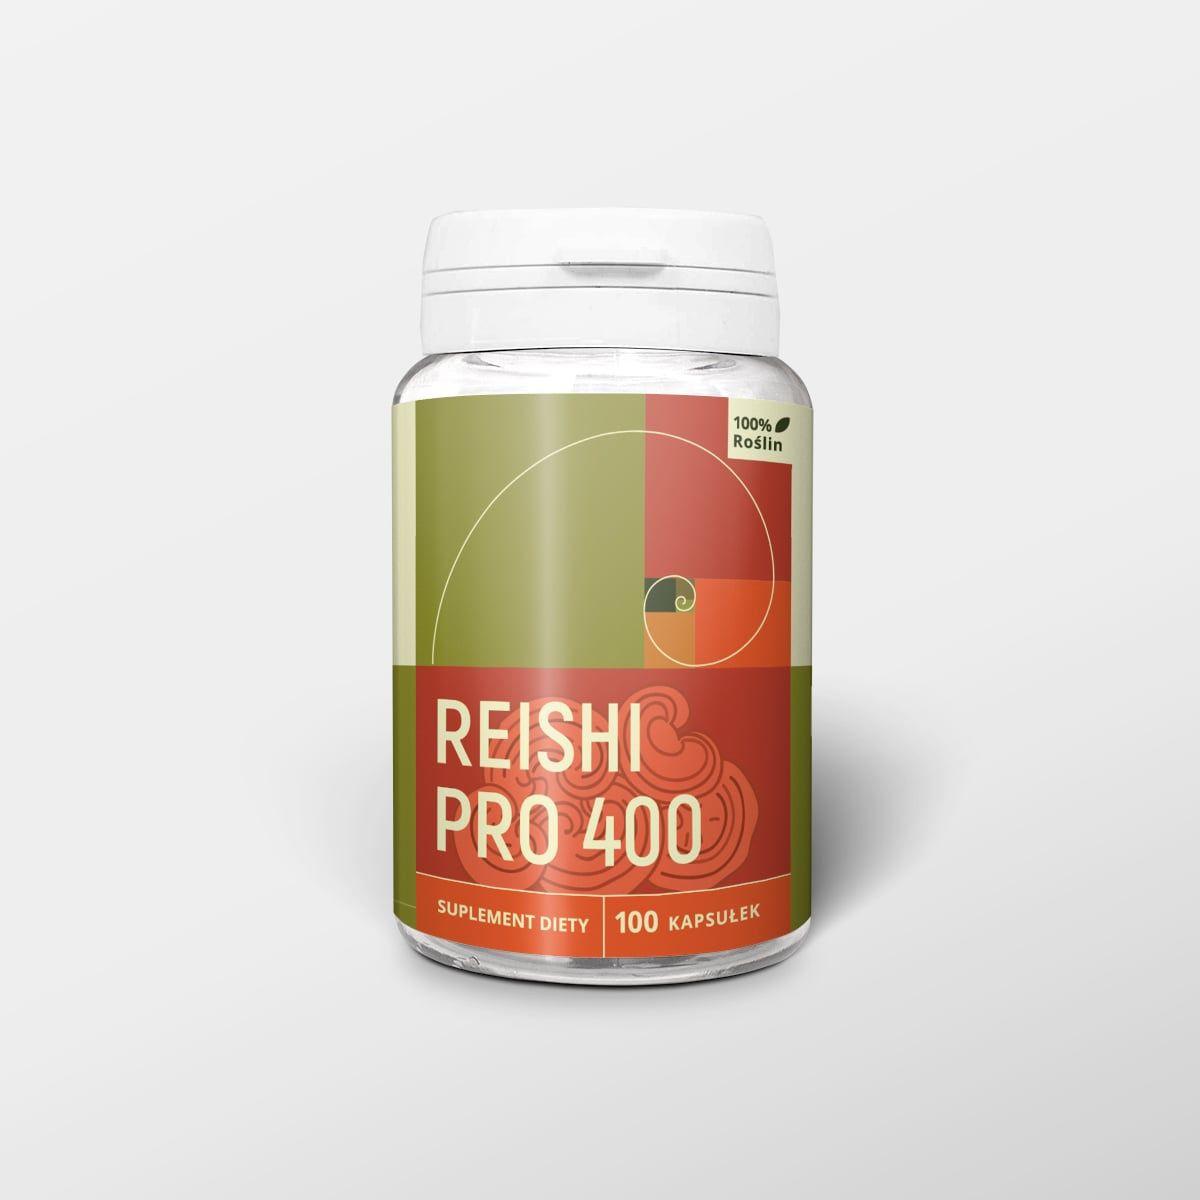 Reishi pro 100 kapsułek x 400 mg